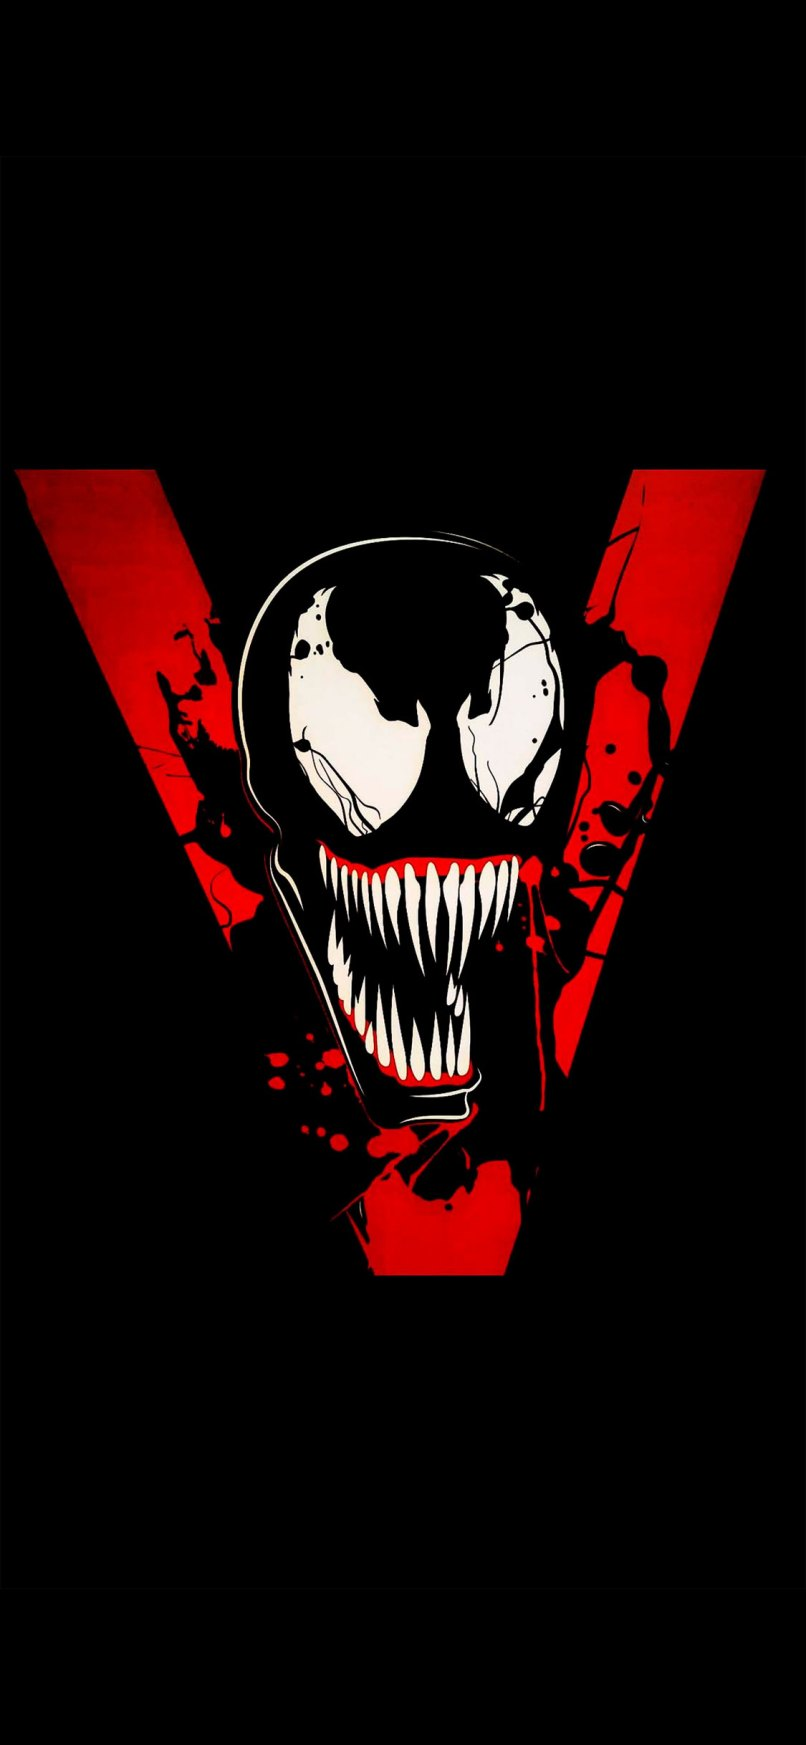 Venom Wallpaper Hd Iphone X Floweryred2 Com